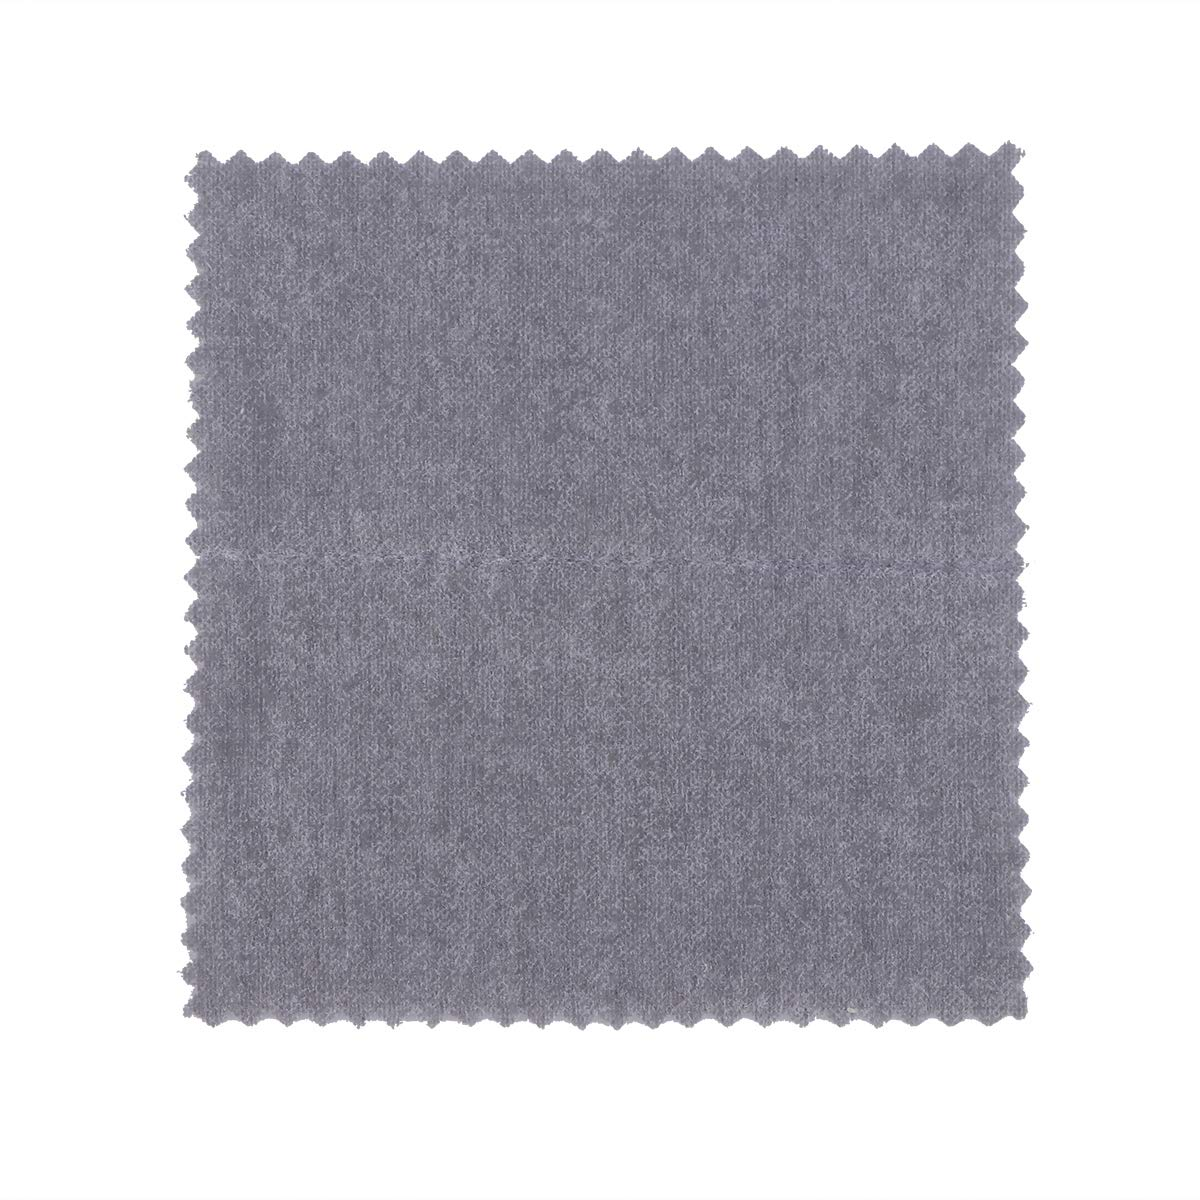 Vosarea Car Scratch Cloth Polish Cloth Repair Tool Nano Surface Rags Car Accessories